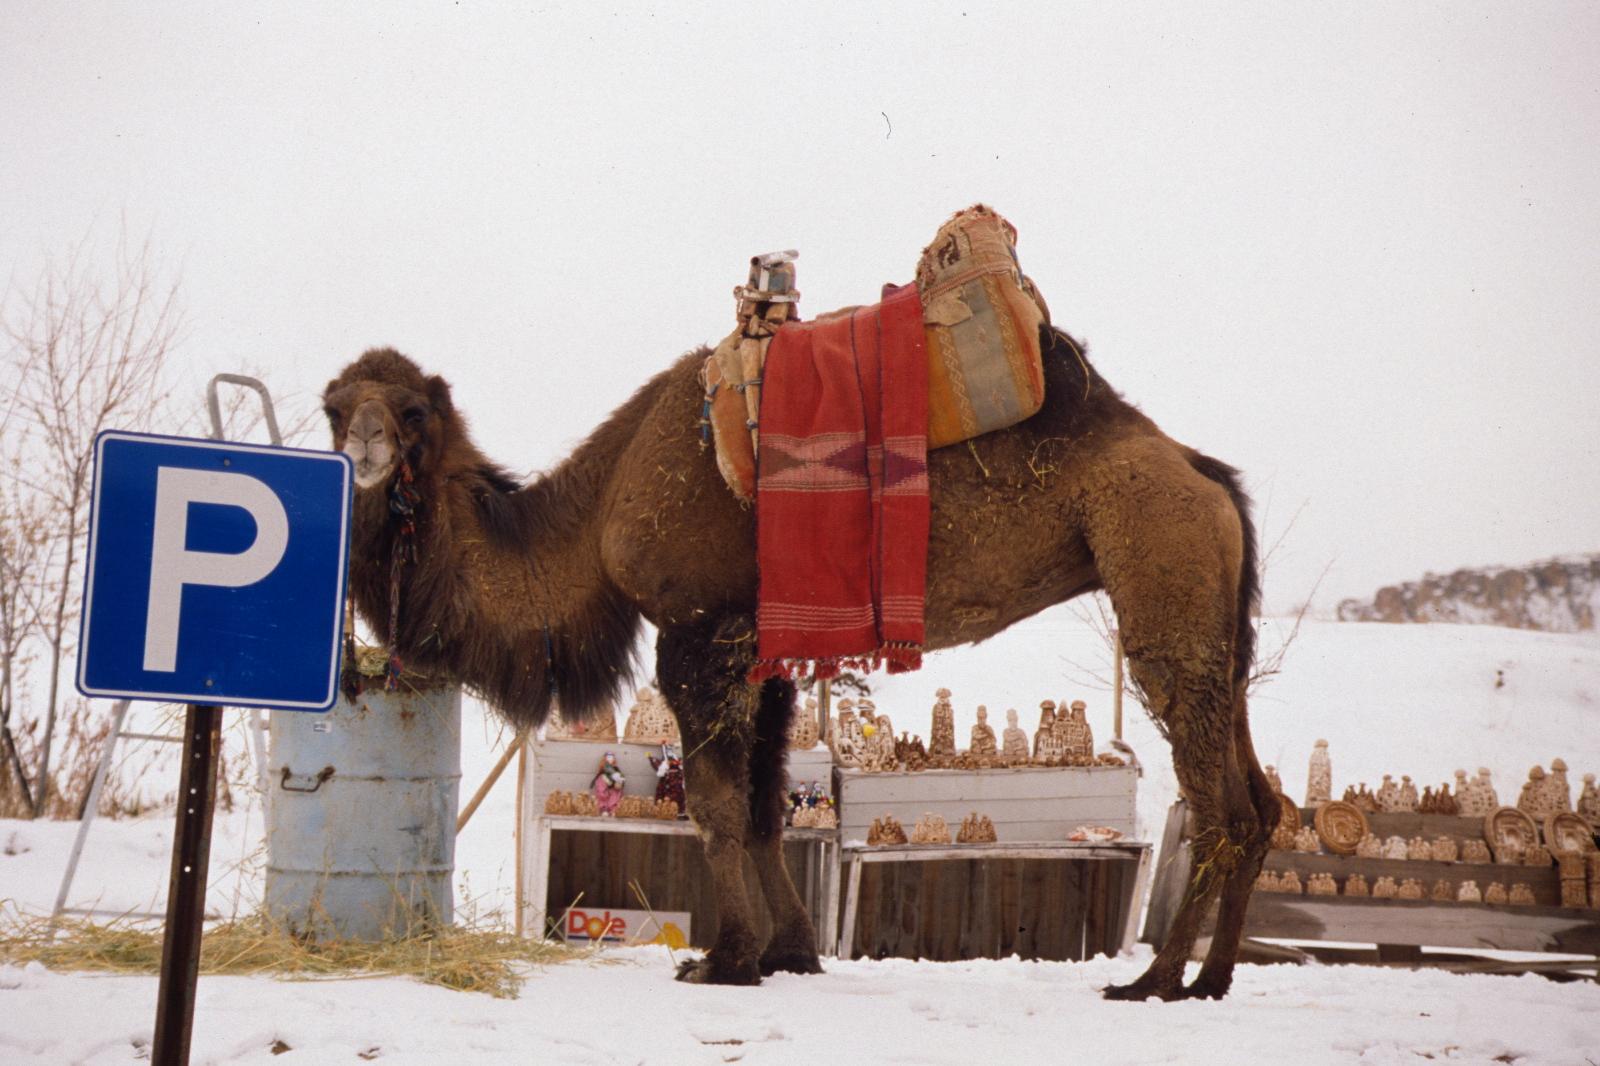 Parked Camel